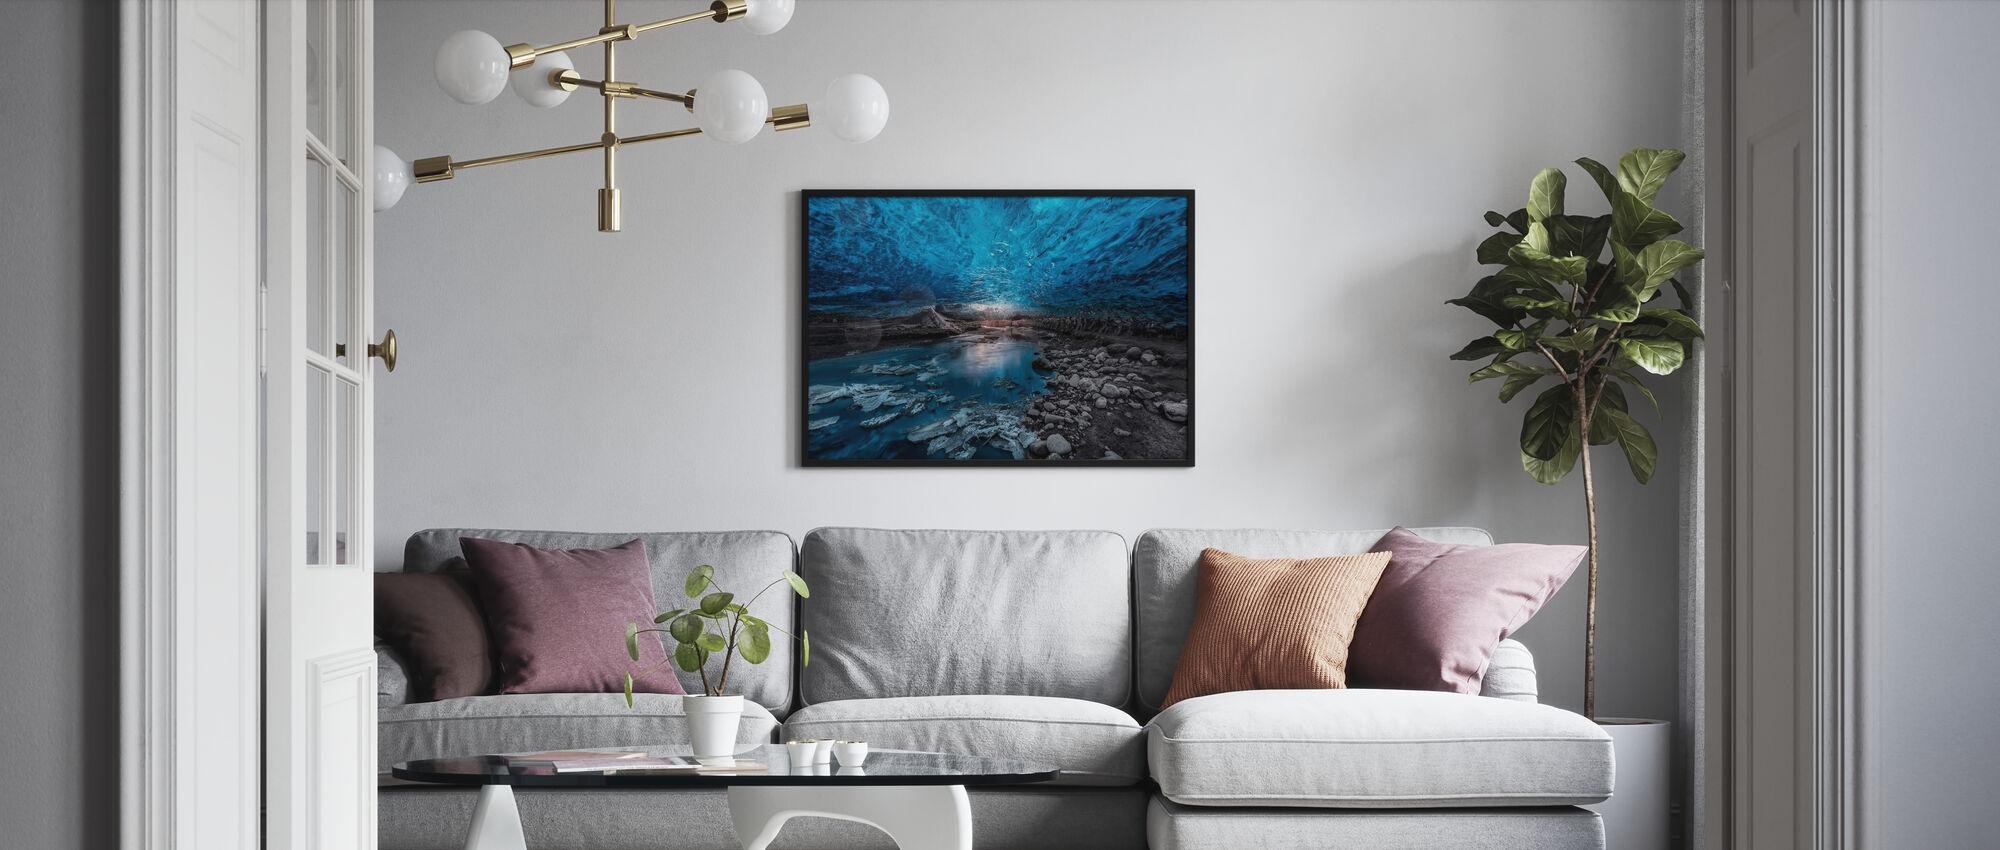 Ice Cave - Framed print - Living Room